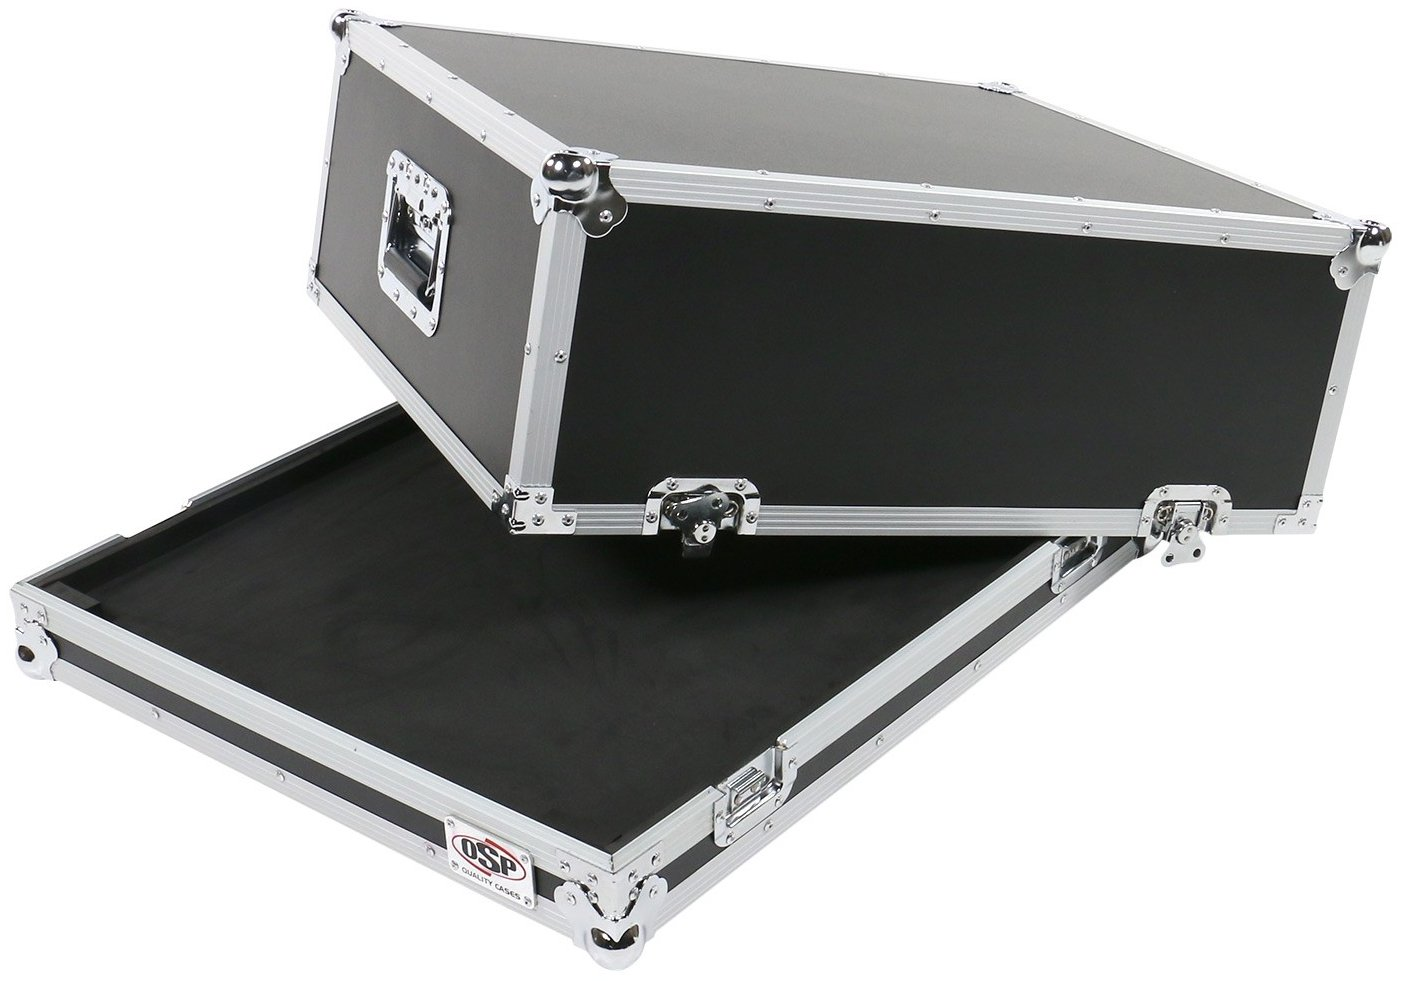 Flightcase for Yamaha TF3 Digital Mixing Console